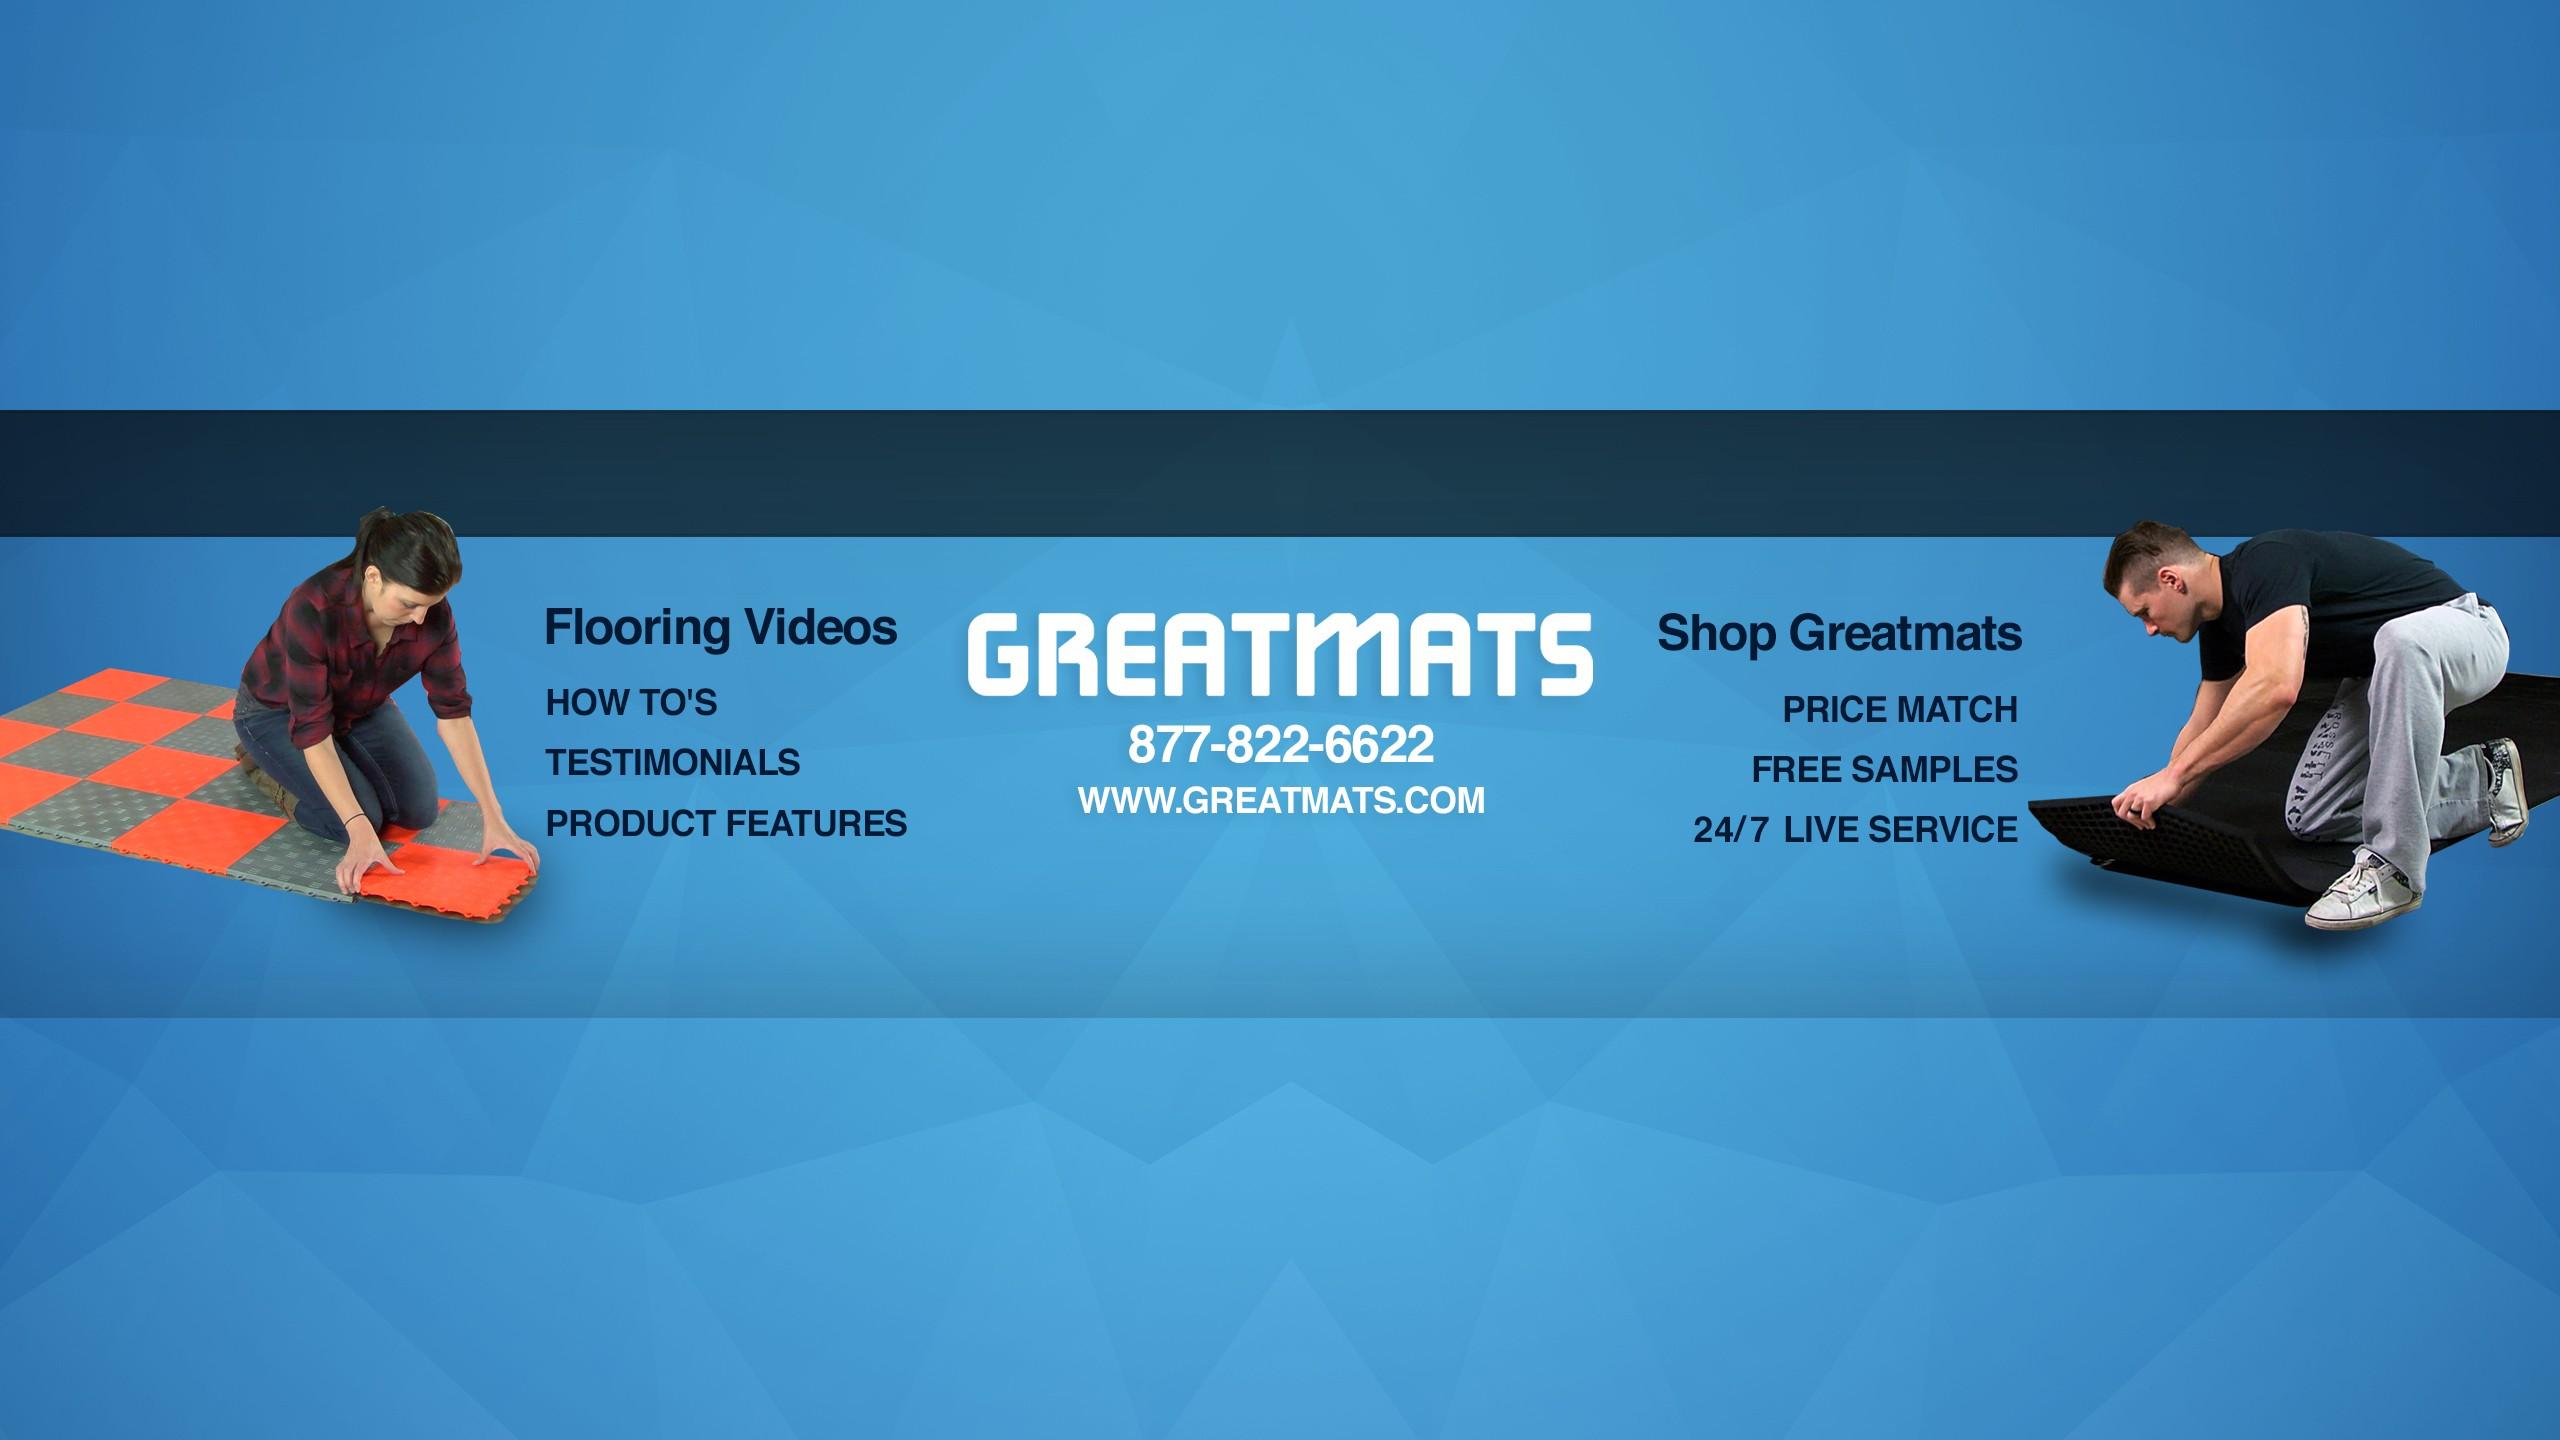 Greatmats | LinkedIn